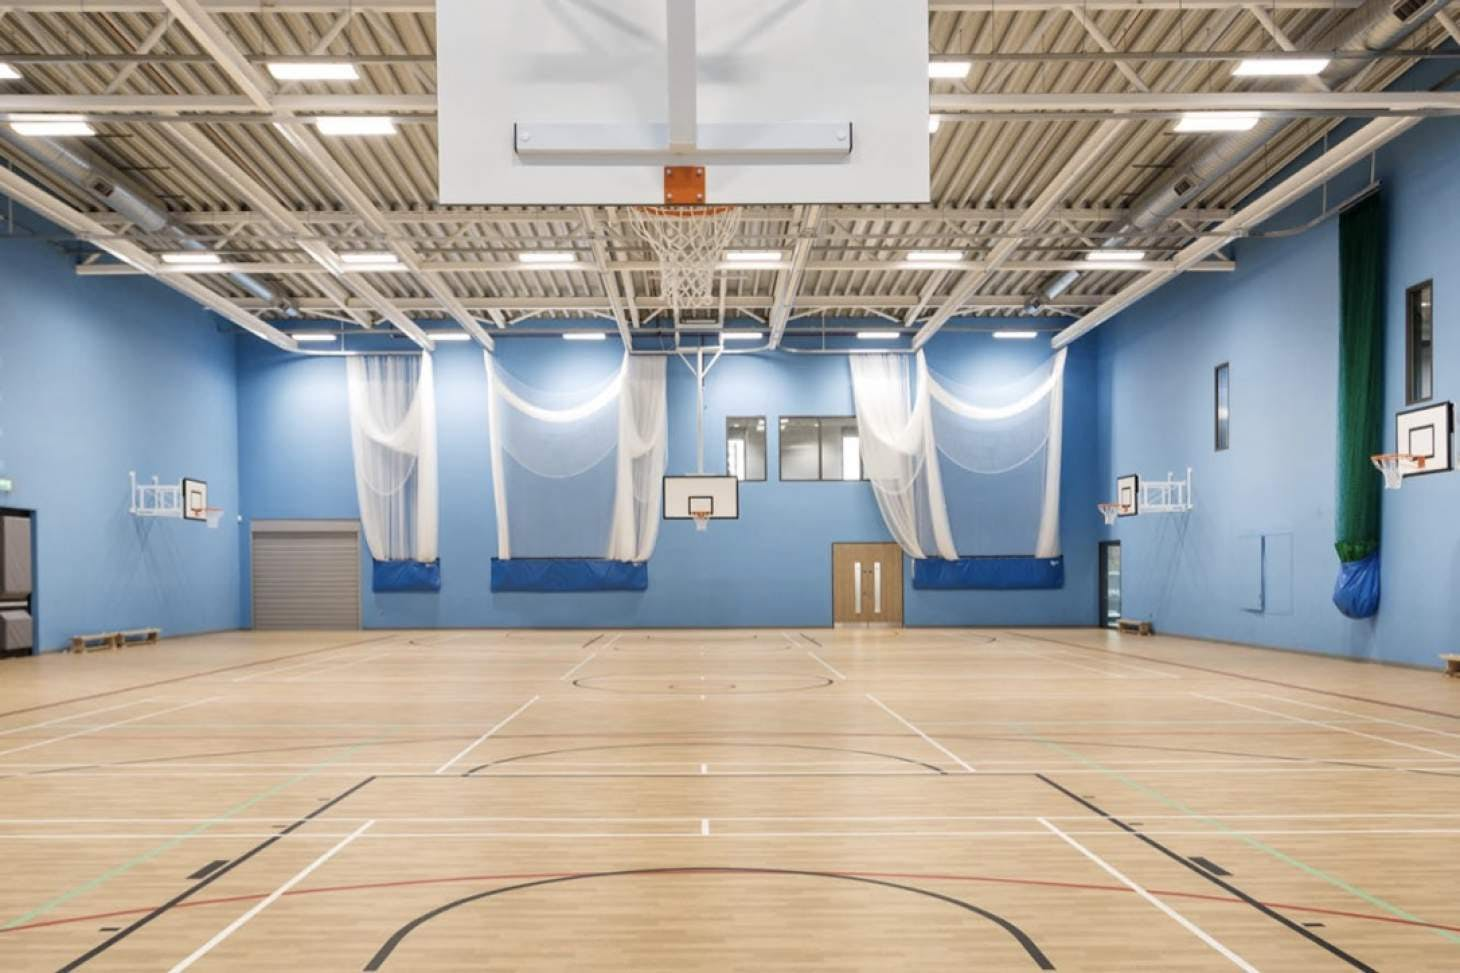 Beaumont School Nets | Sports hall cricket facilities